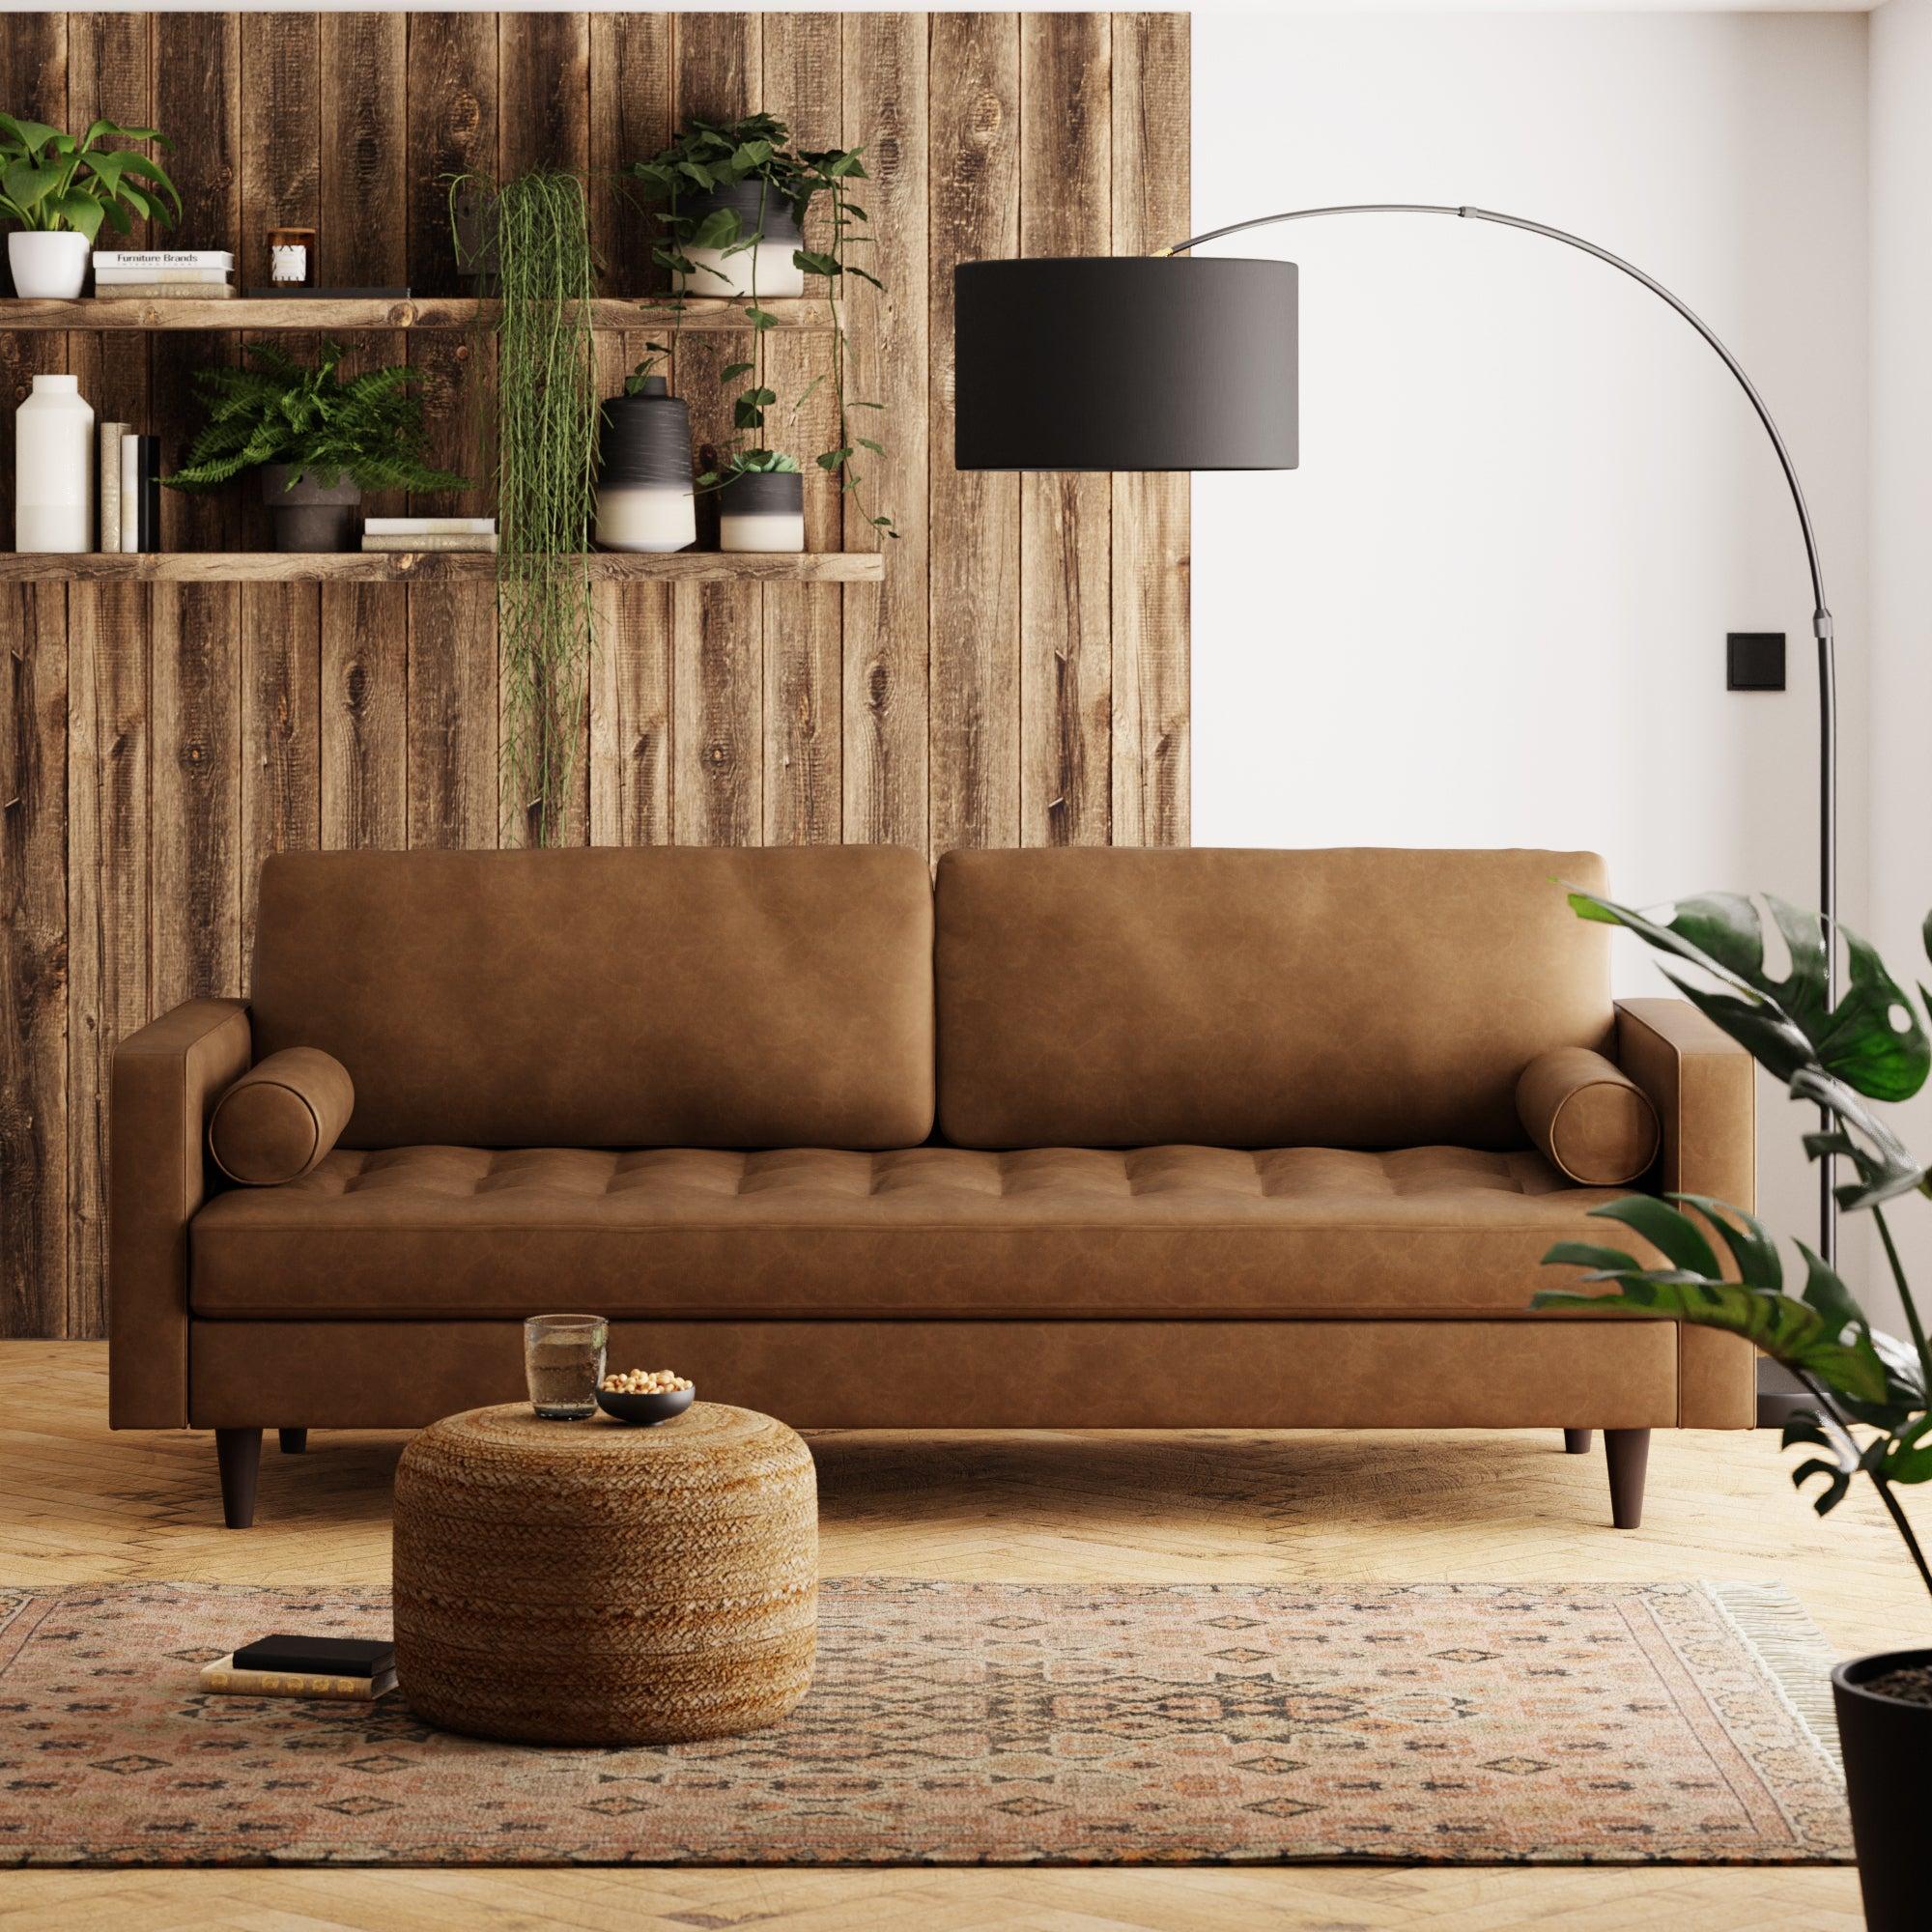 Zoe Faux Leather 4 Seater Sofa Tan (Brown)